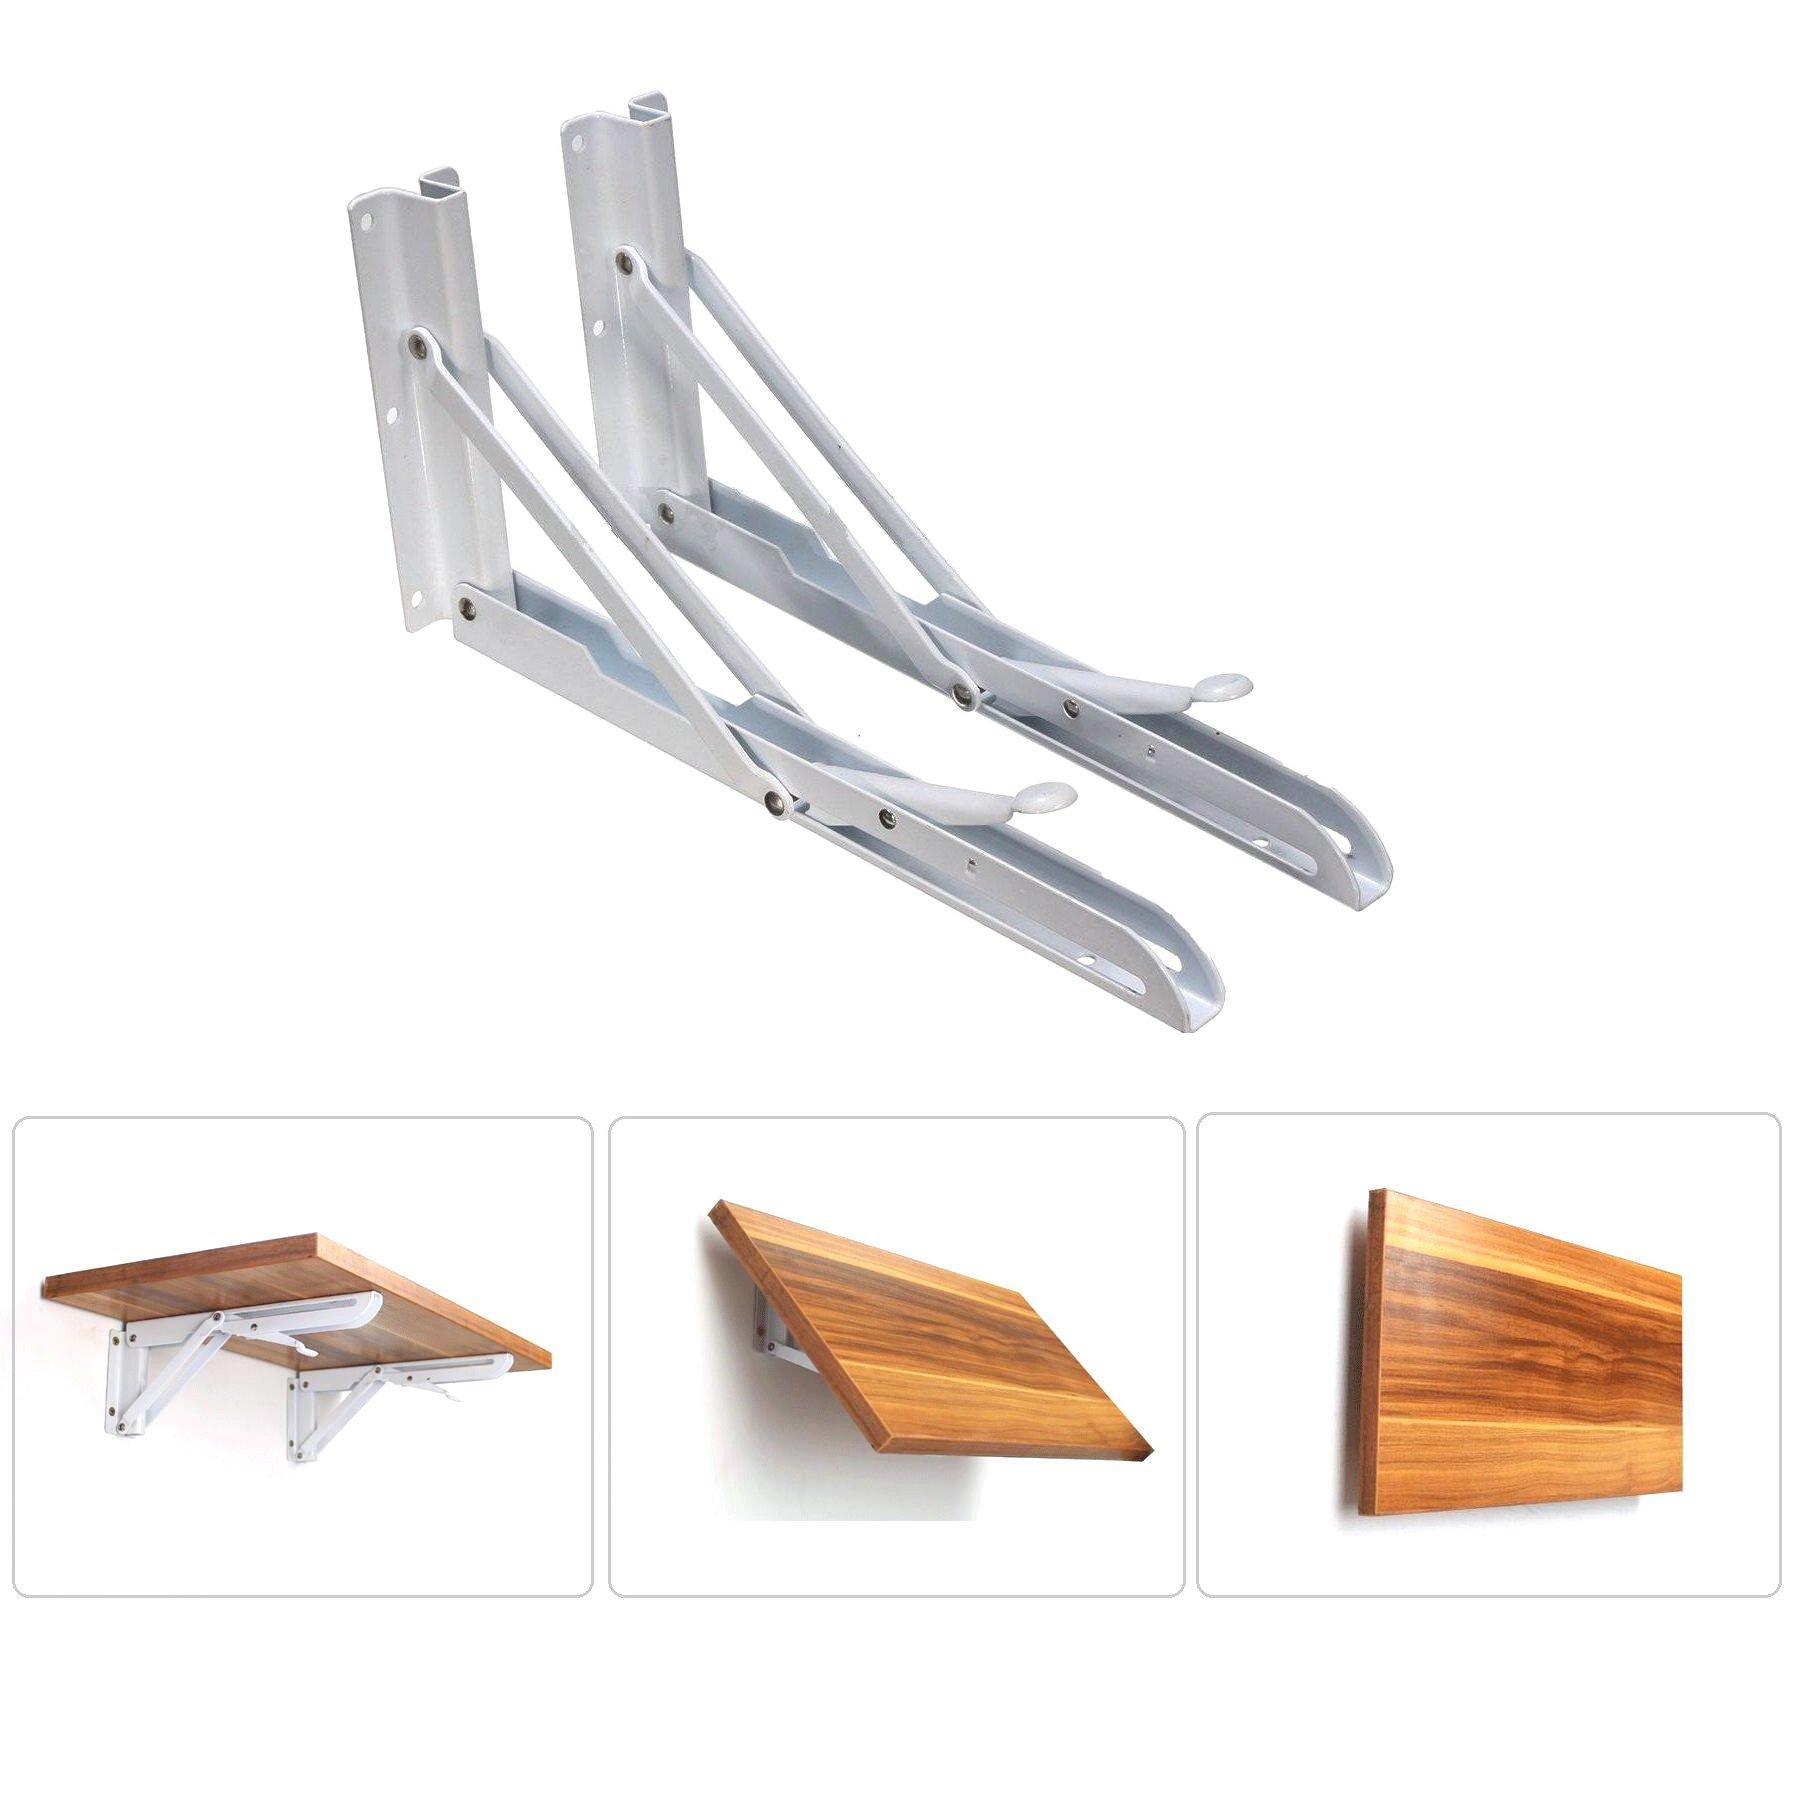 Farmunion 2pcs White Metal Triangle Folding Shelf Bracket Support Wall Bracket